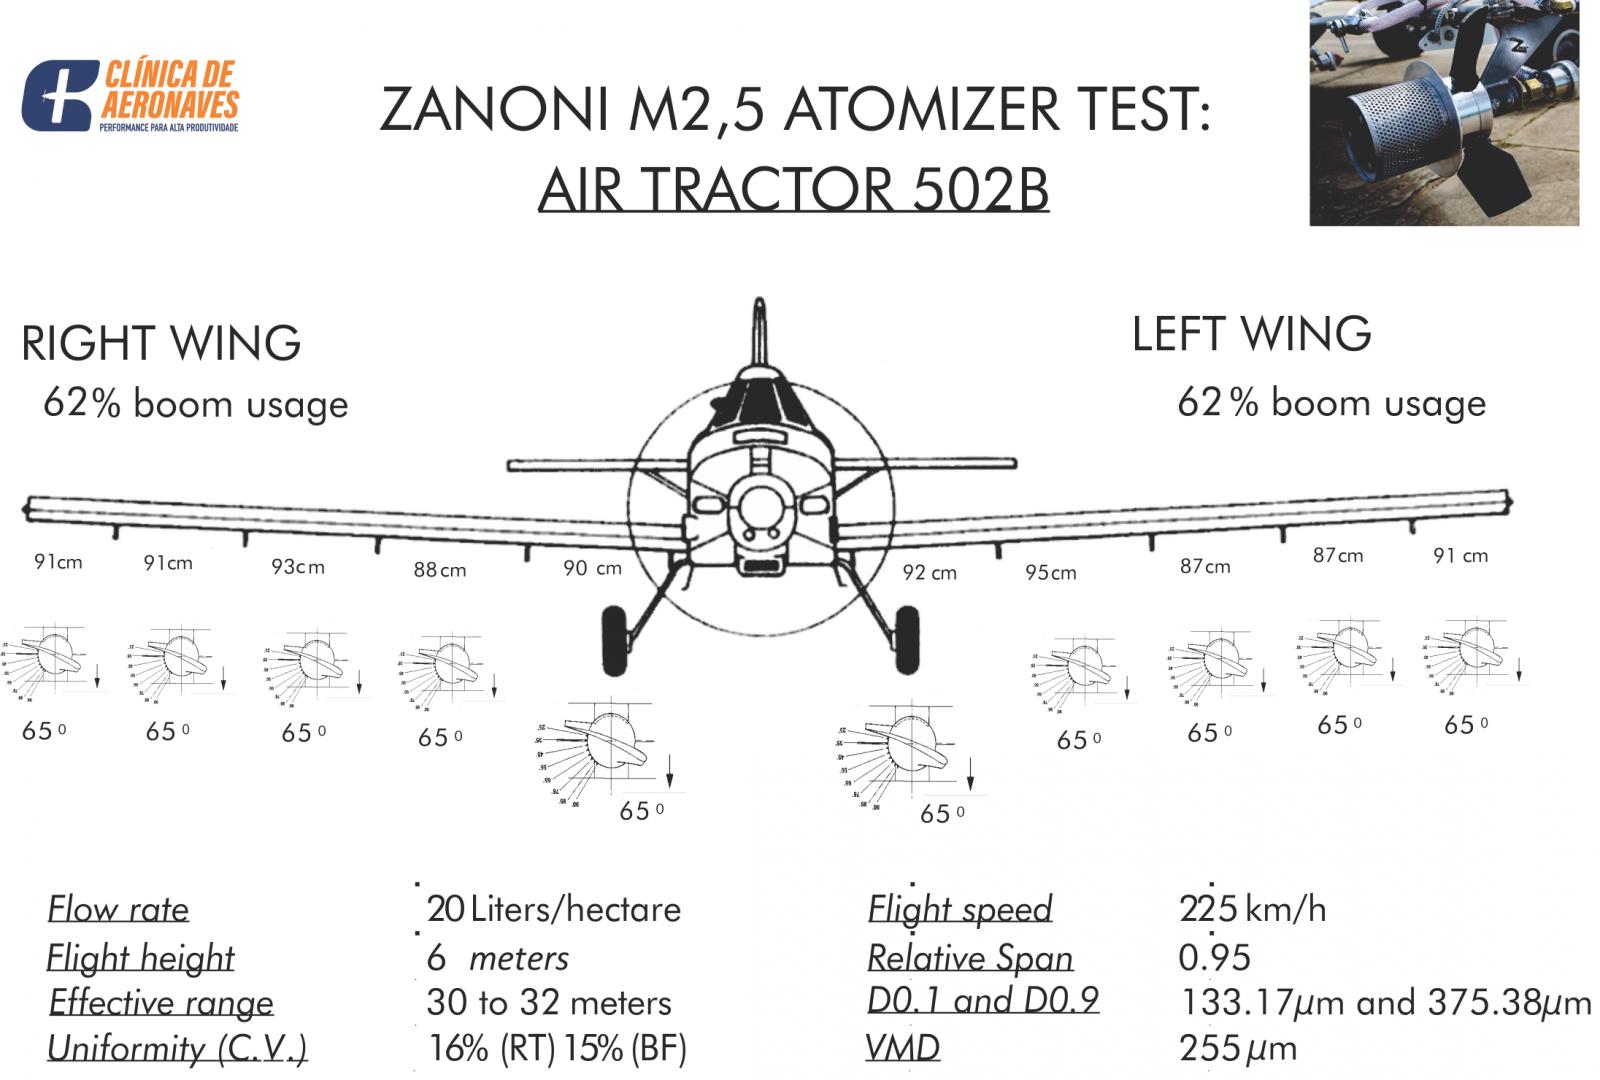 Zanoni atomizer nozzles show excellent performance in turbo aircraft